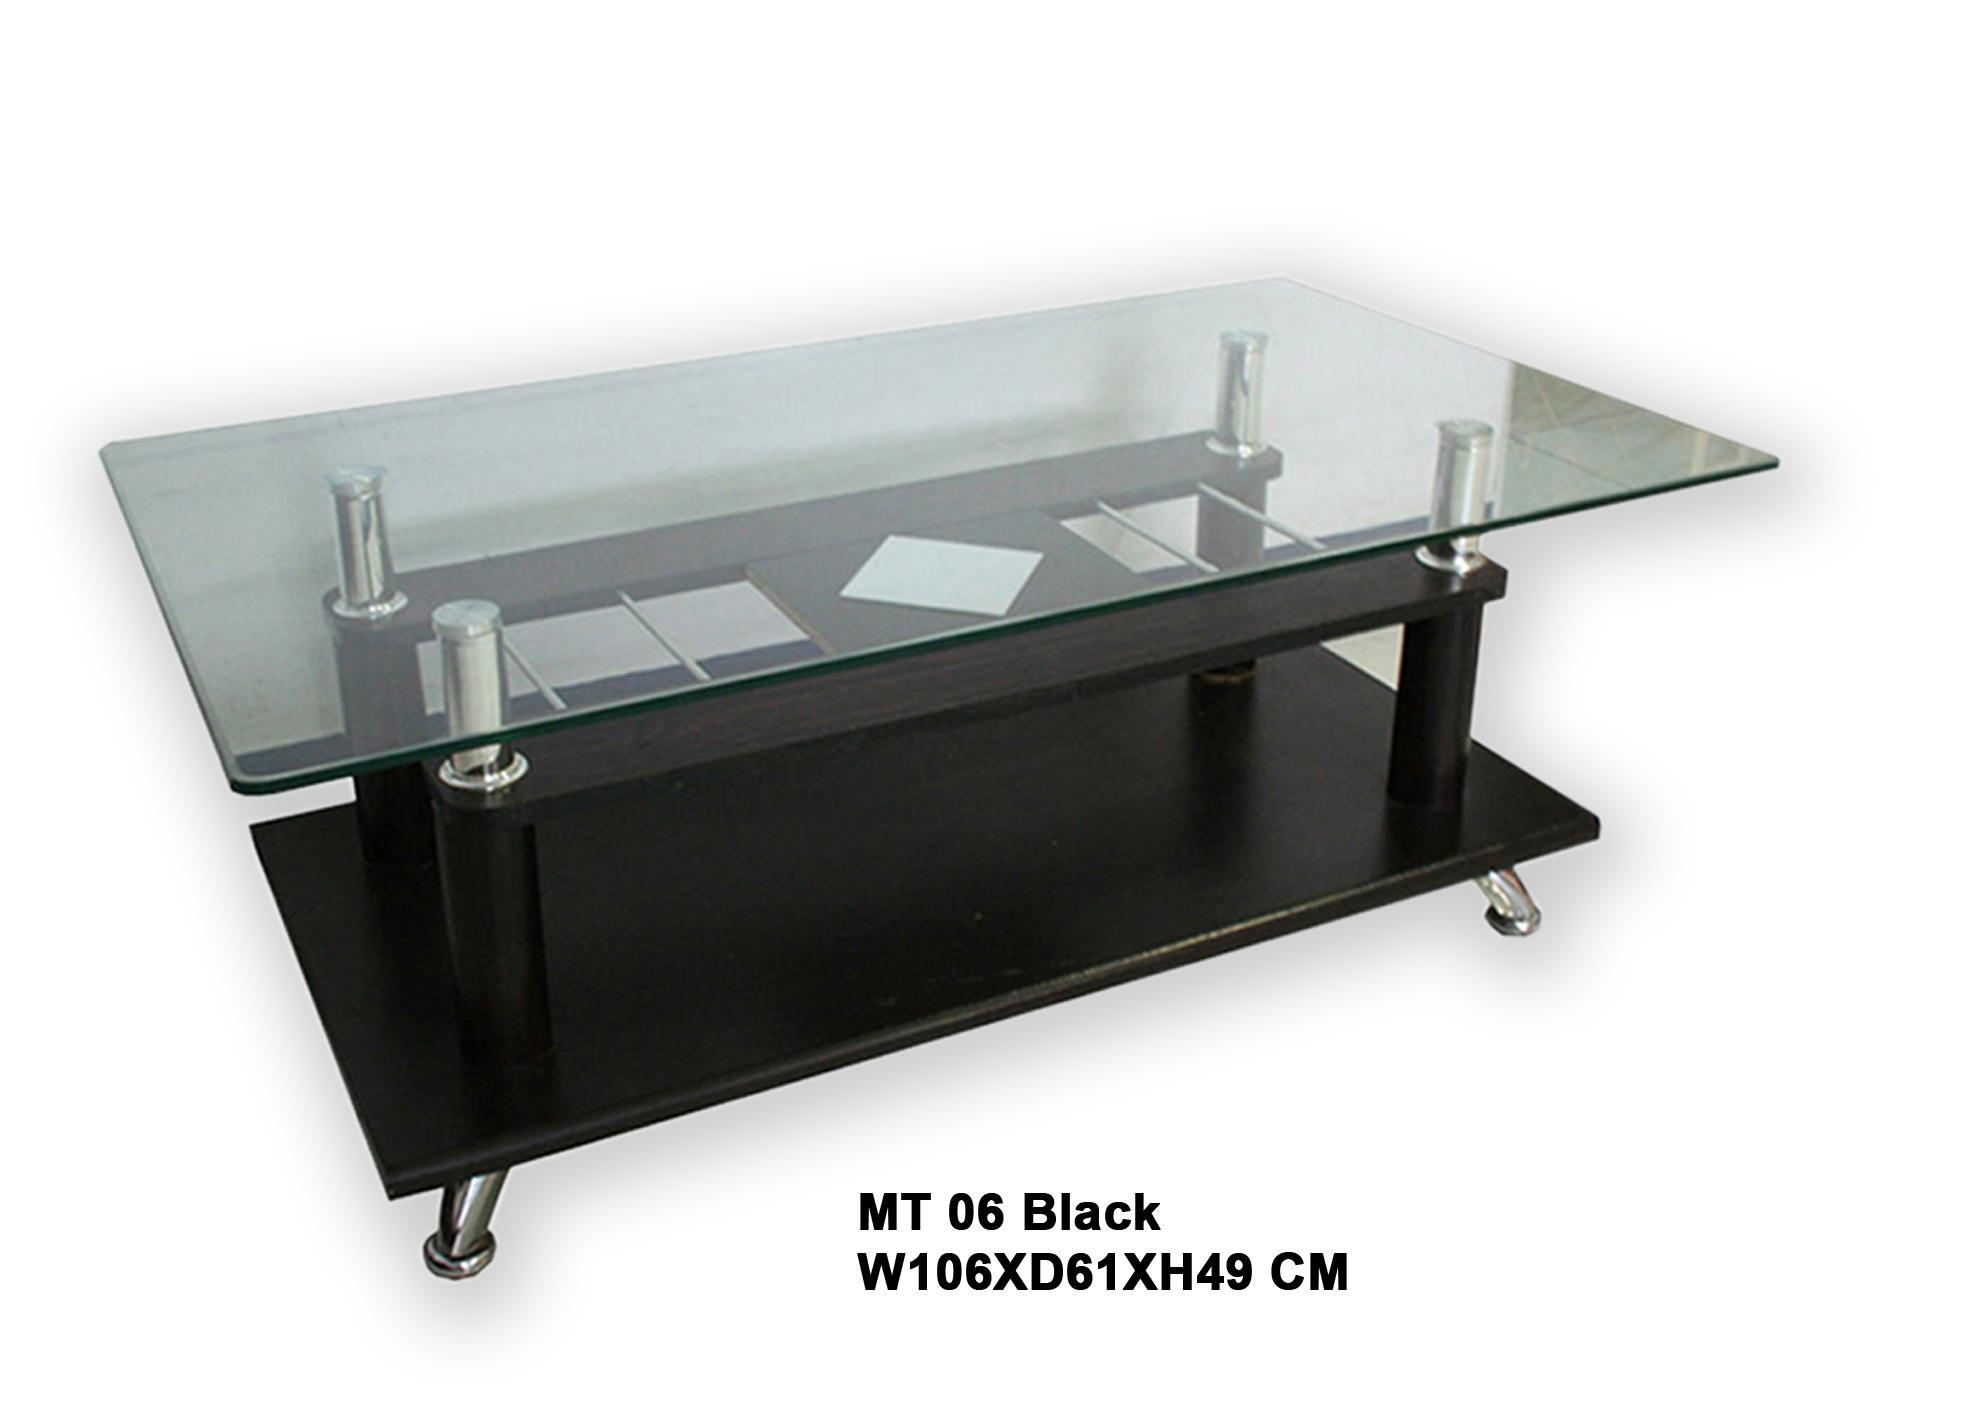 Dongsun Coffee Table/Meja Tamu MT 06 Black